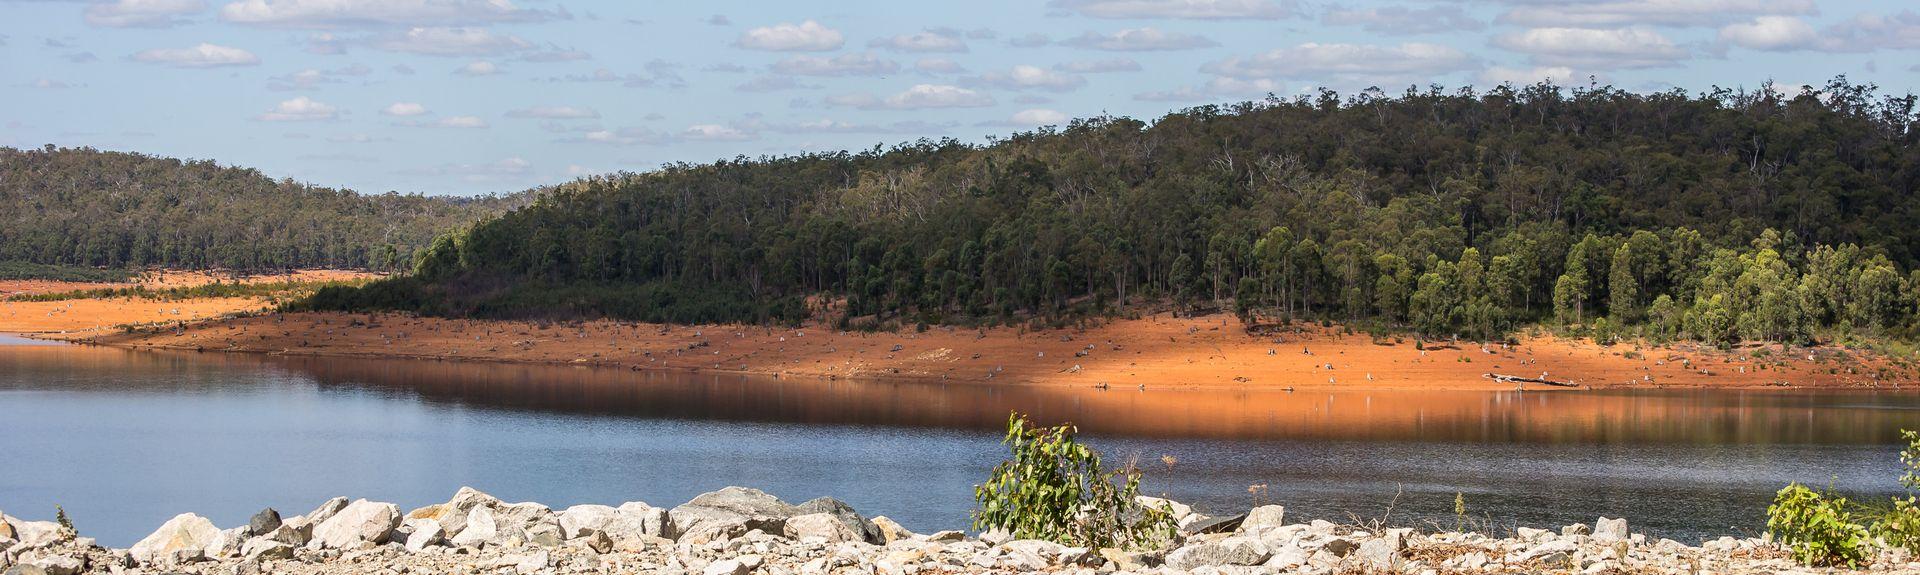 Perth Hills, Perth WA, Australia